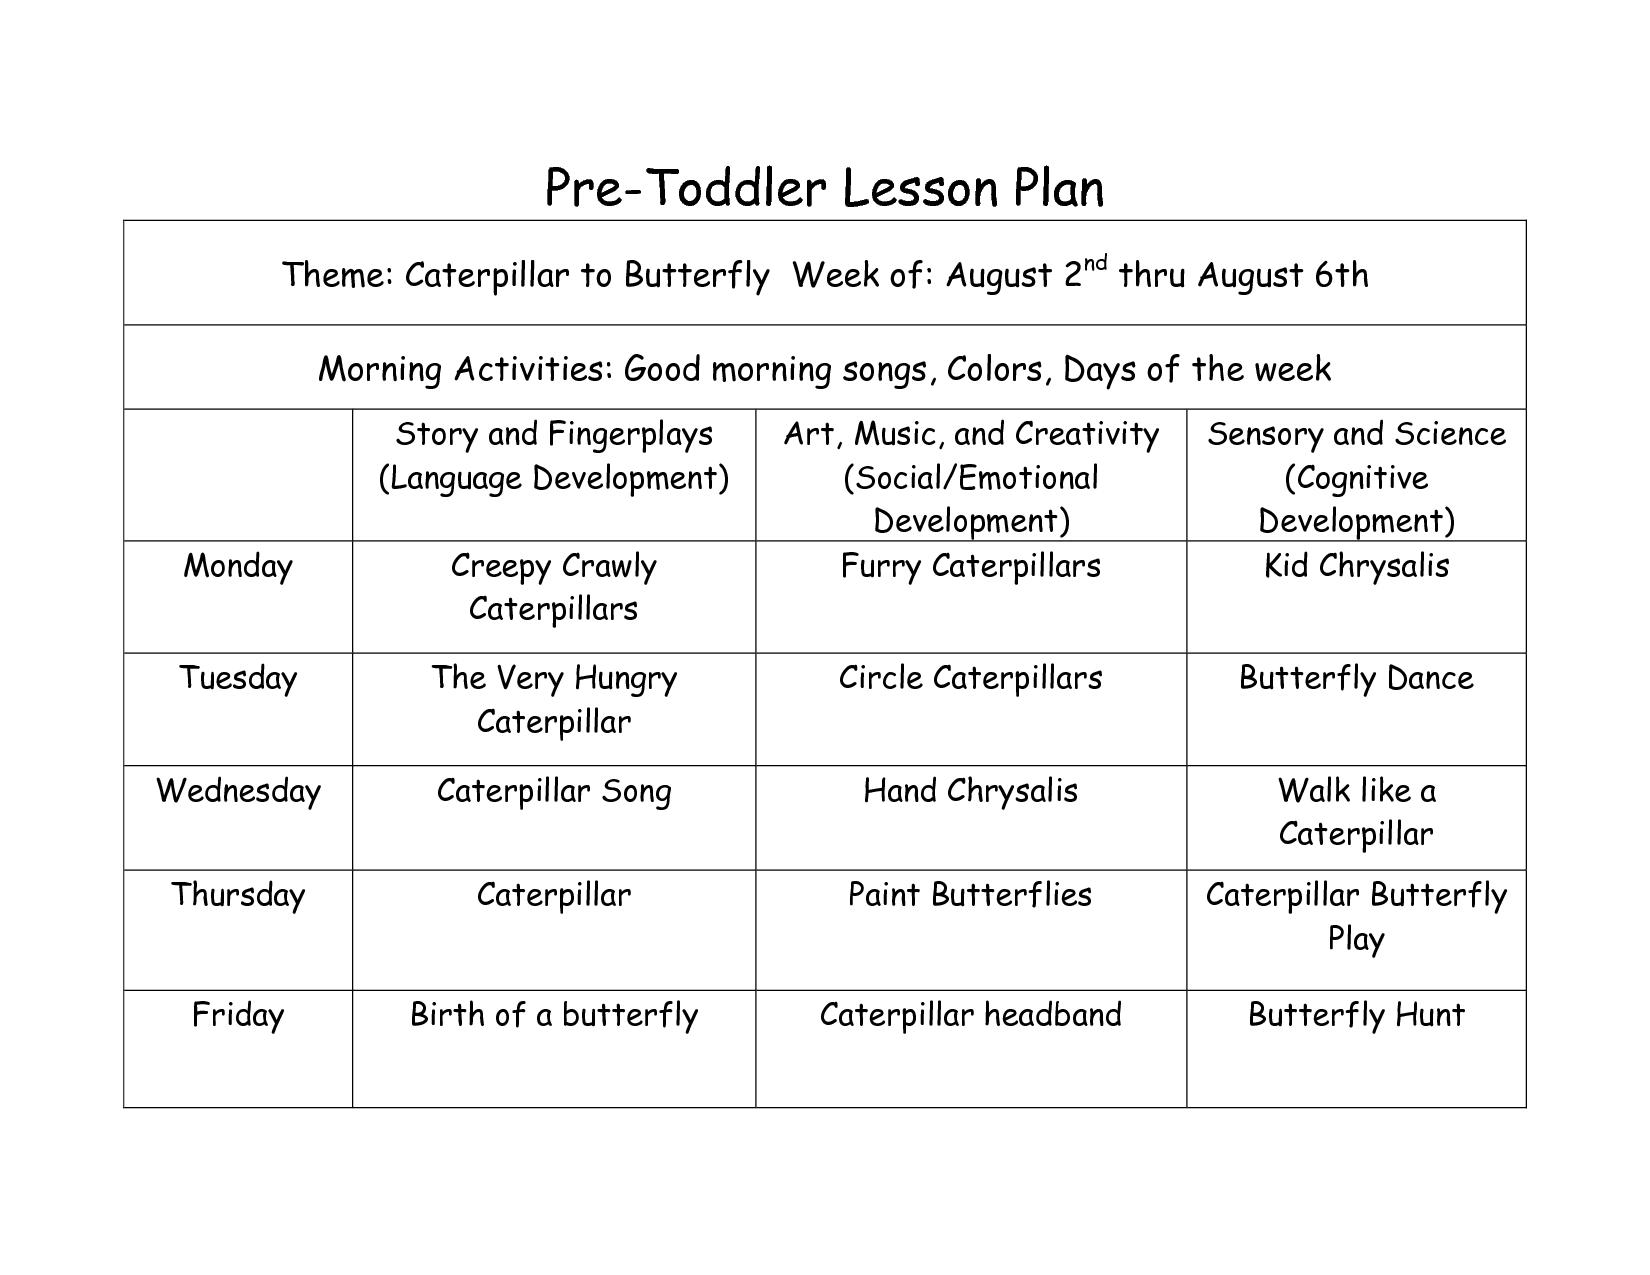 Creative Curriculum Lesson Plan Template